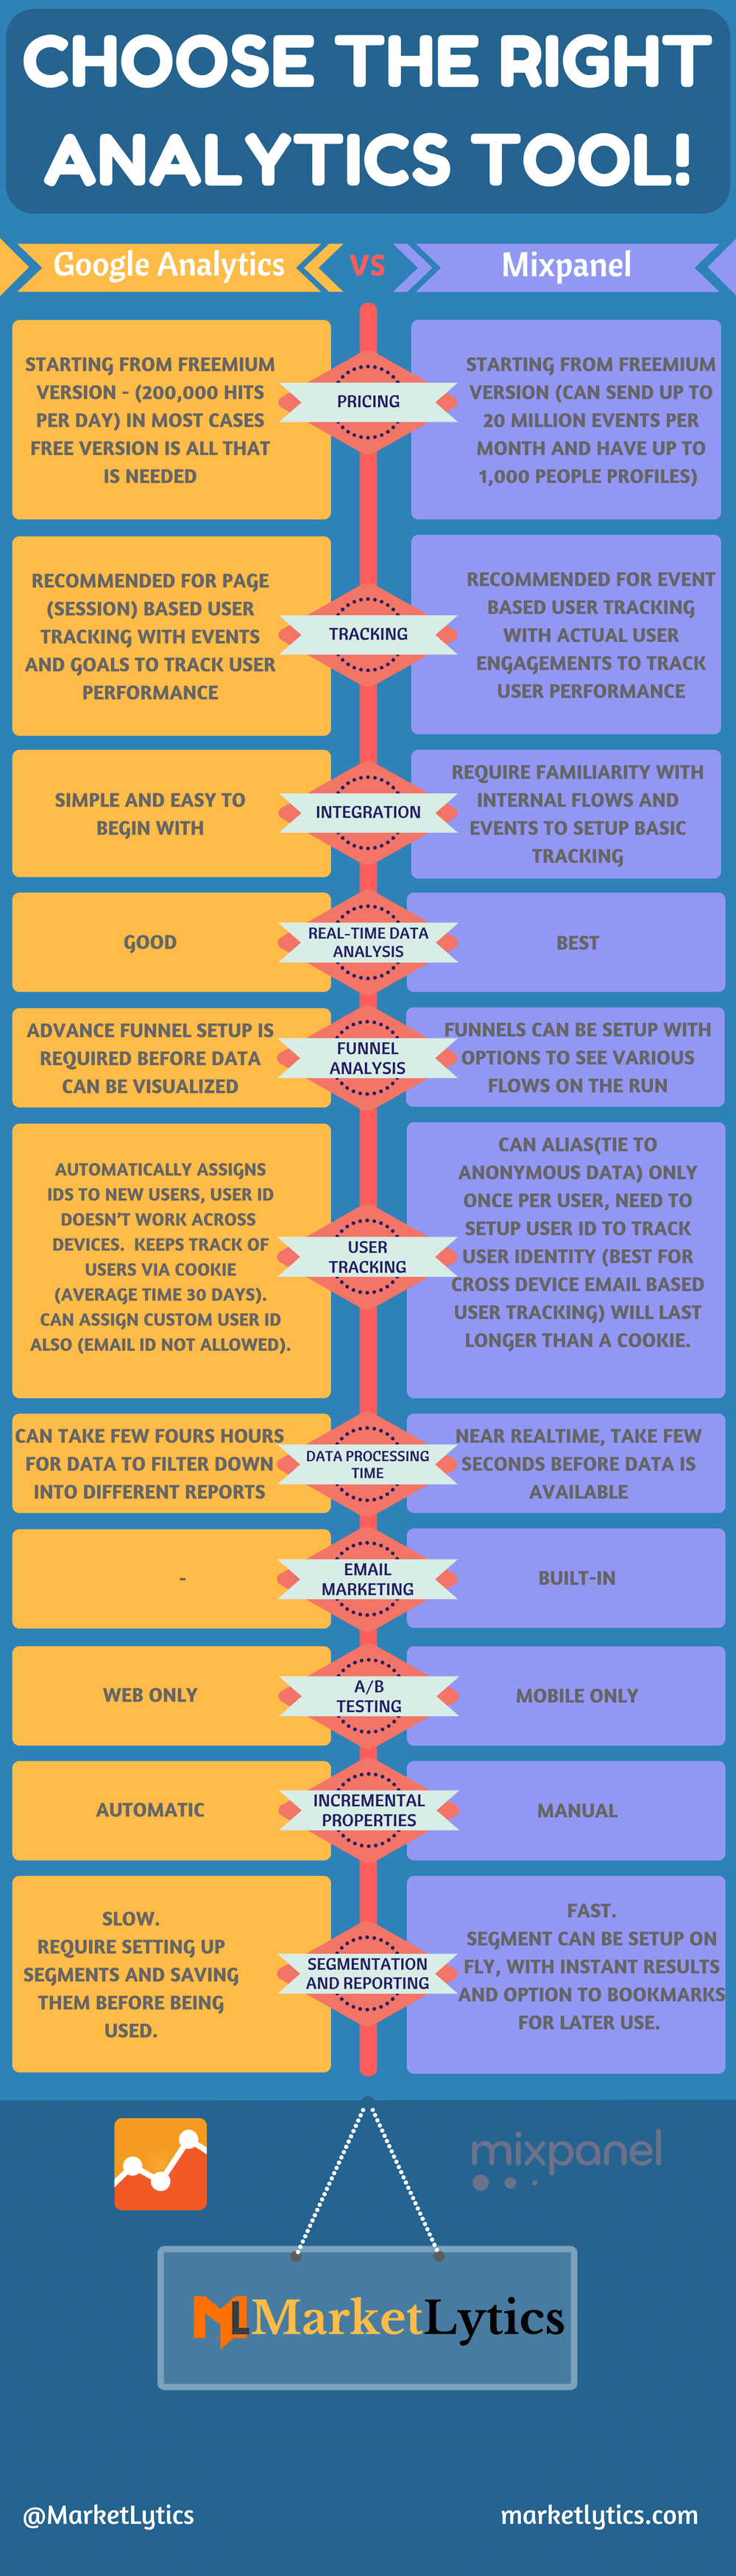 mixpanel vs google analytics